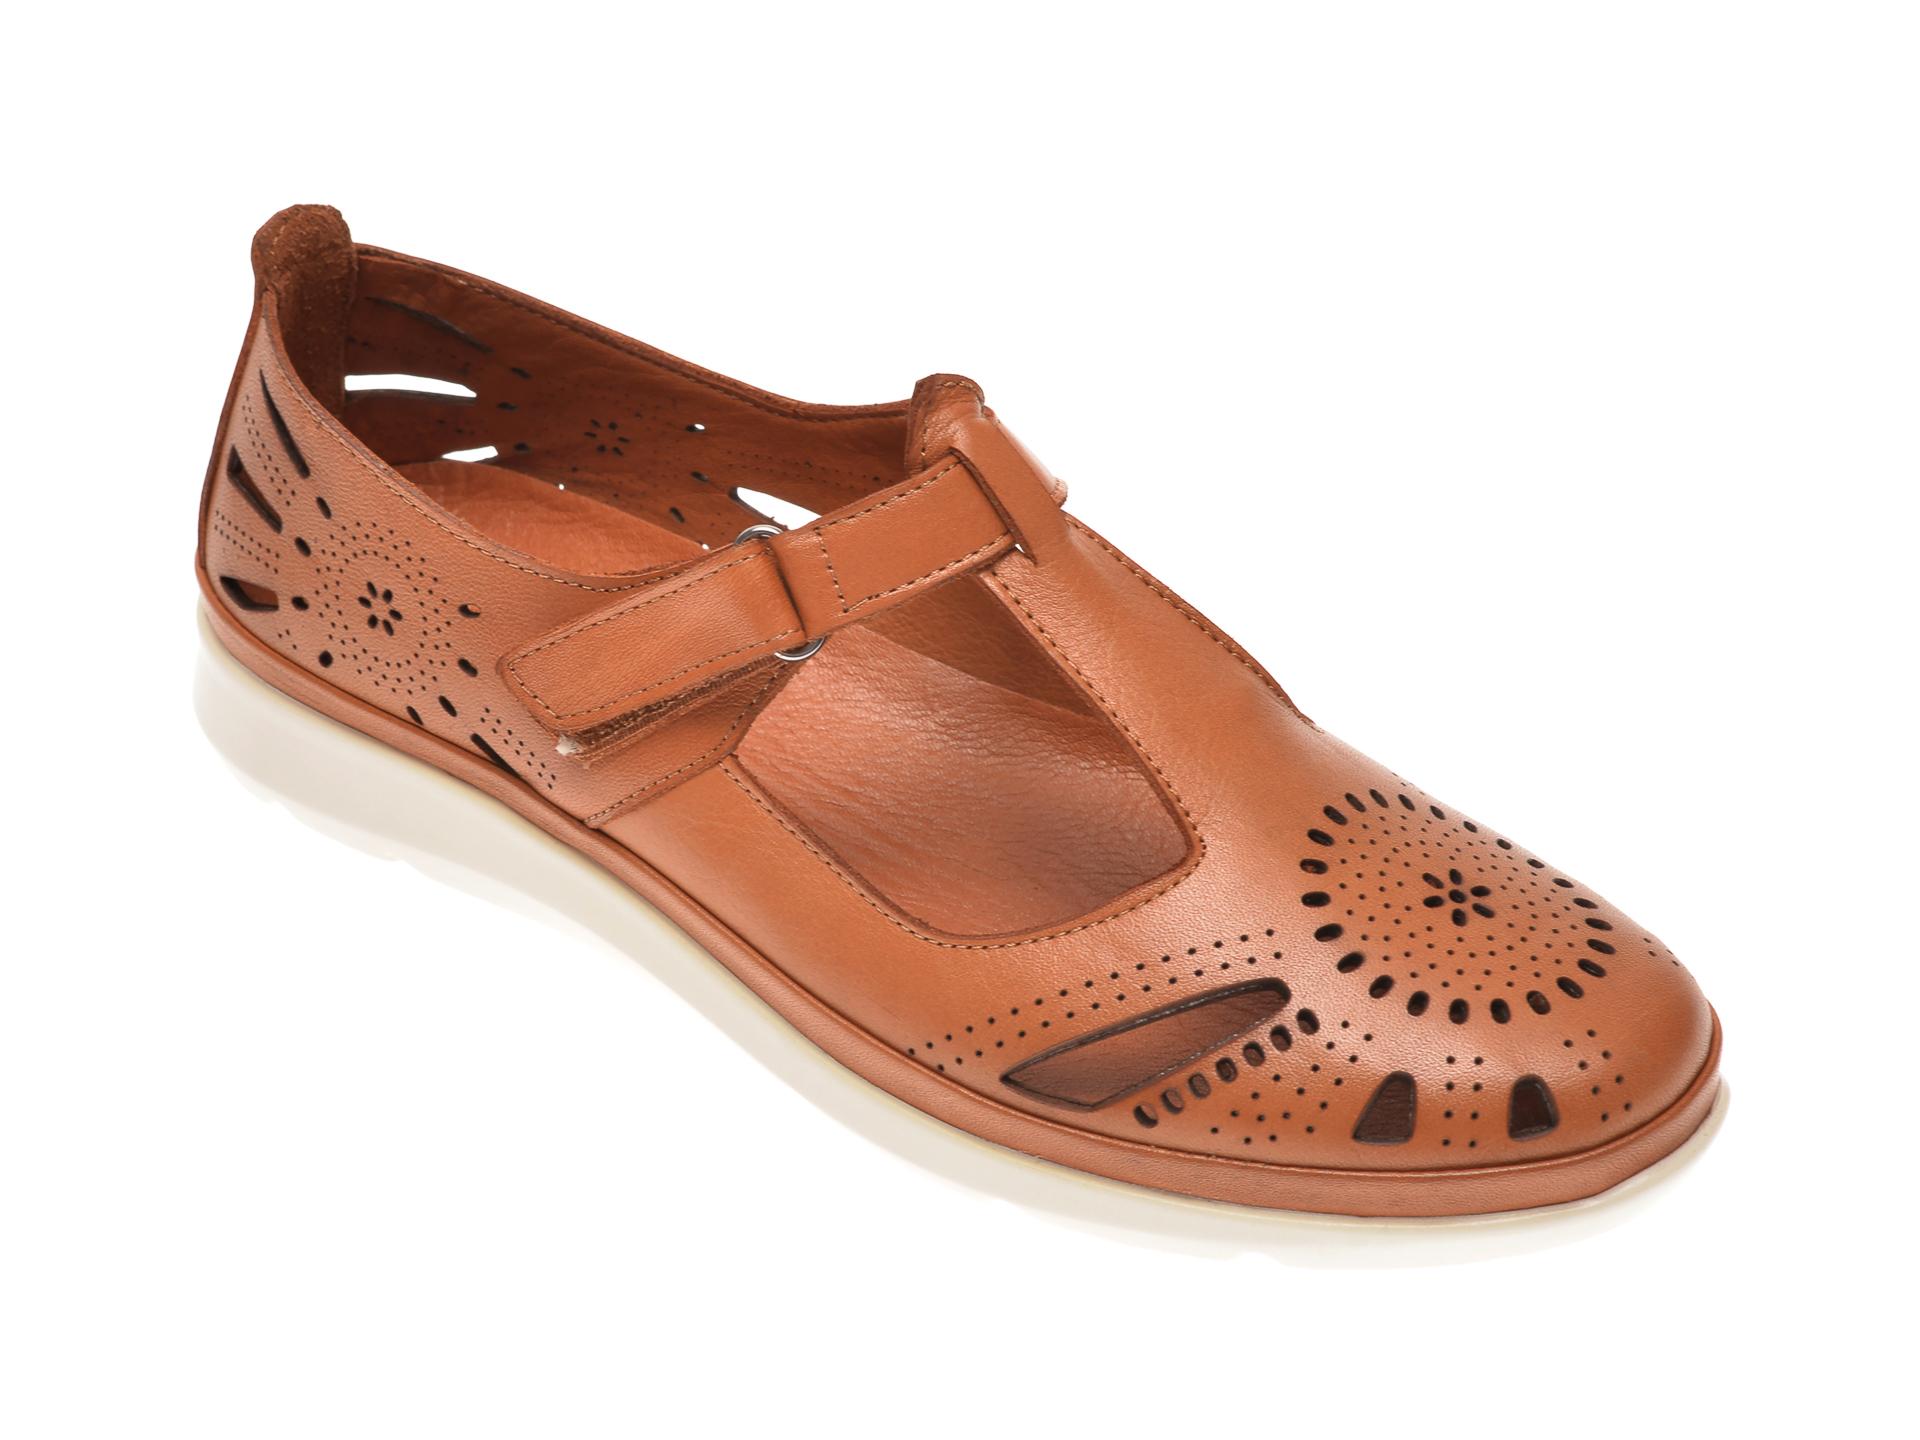 Pantofi X TREND maro, 602, din piele naturala